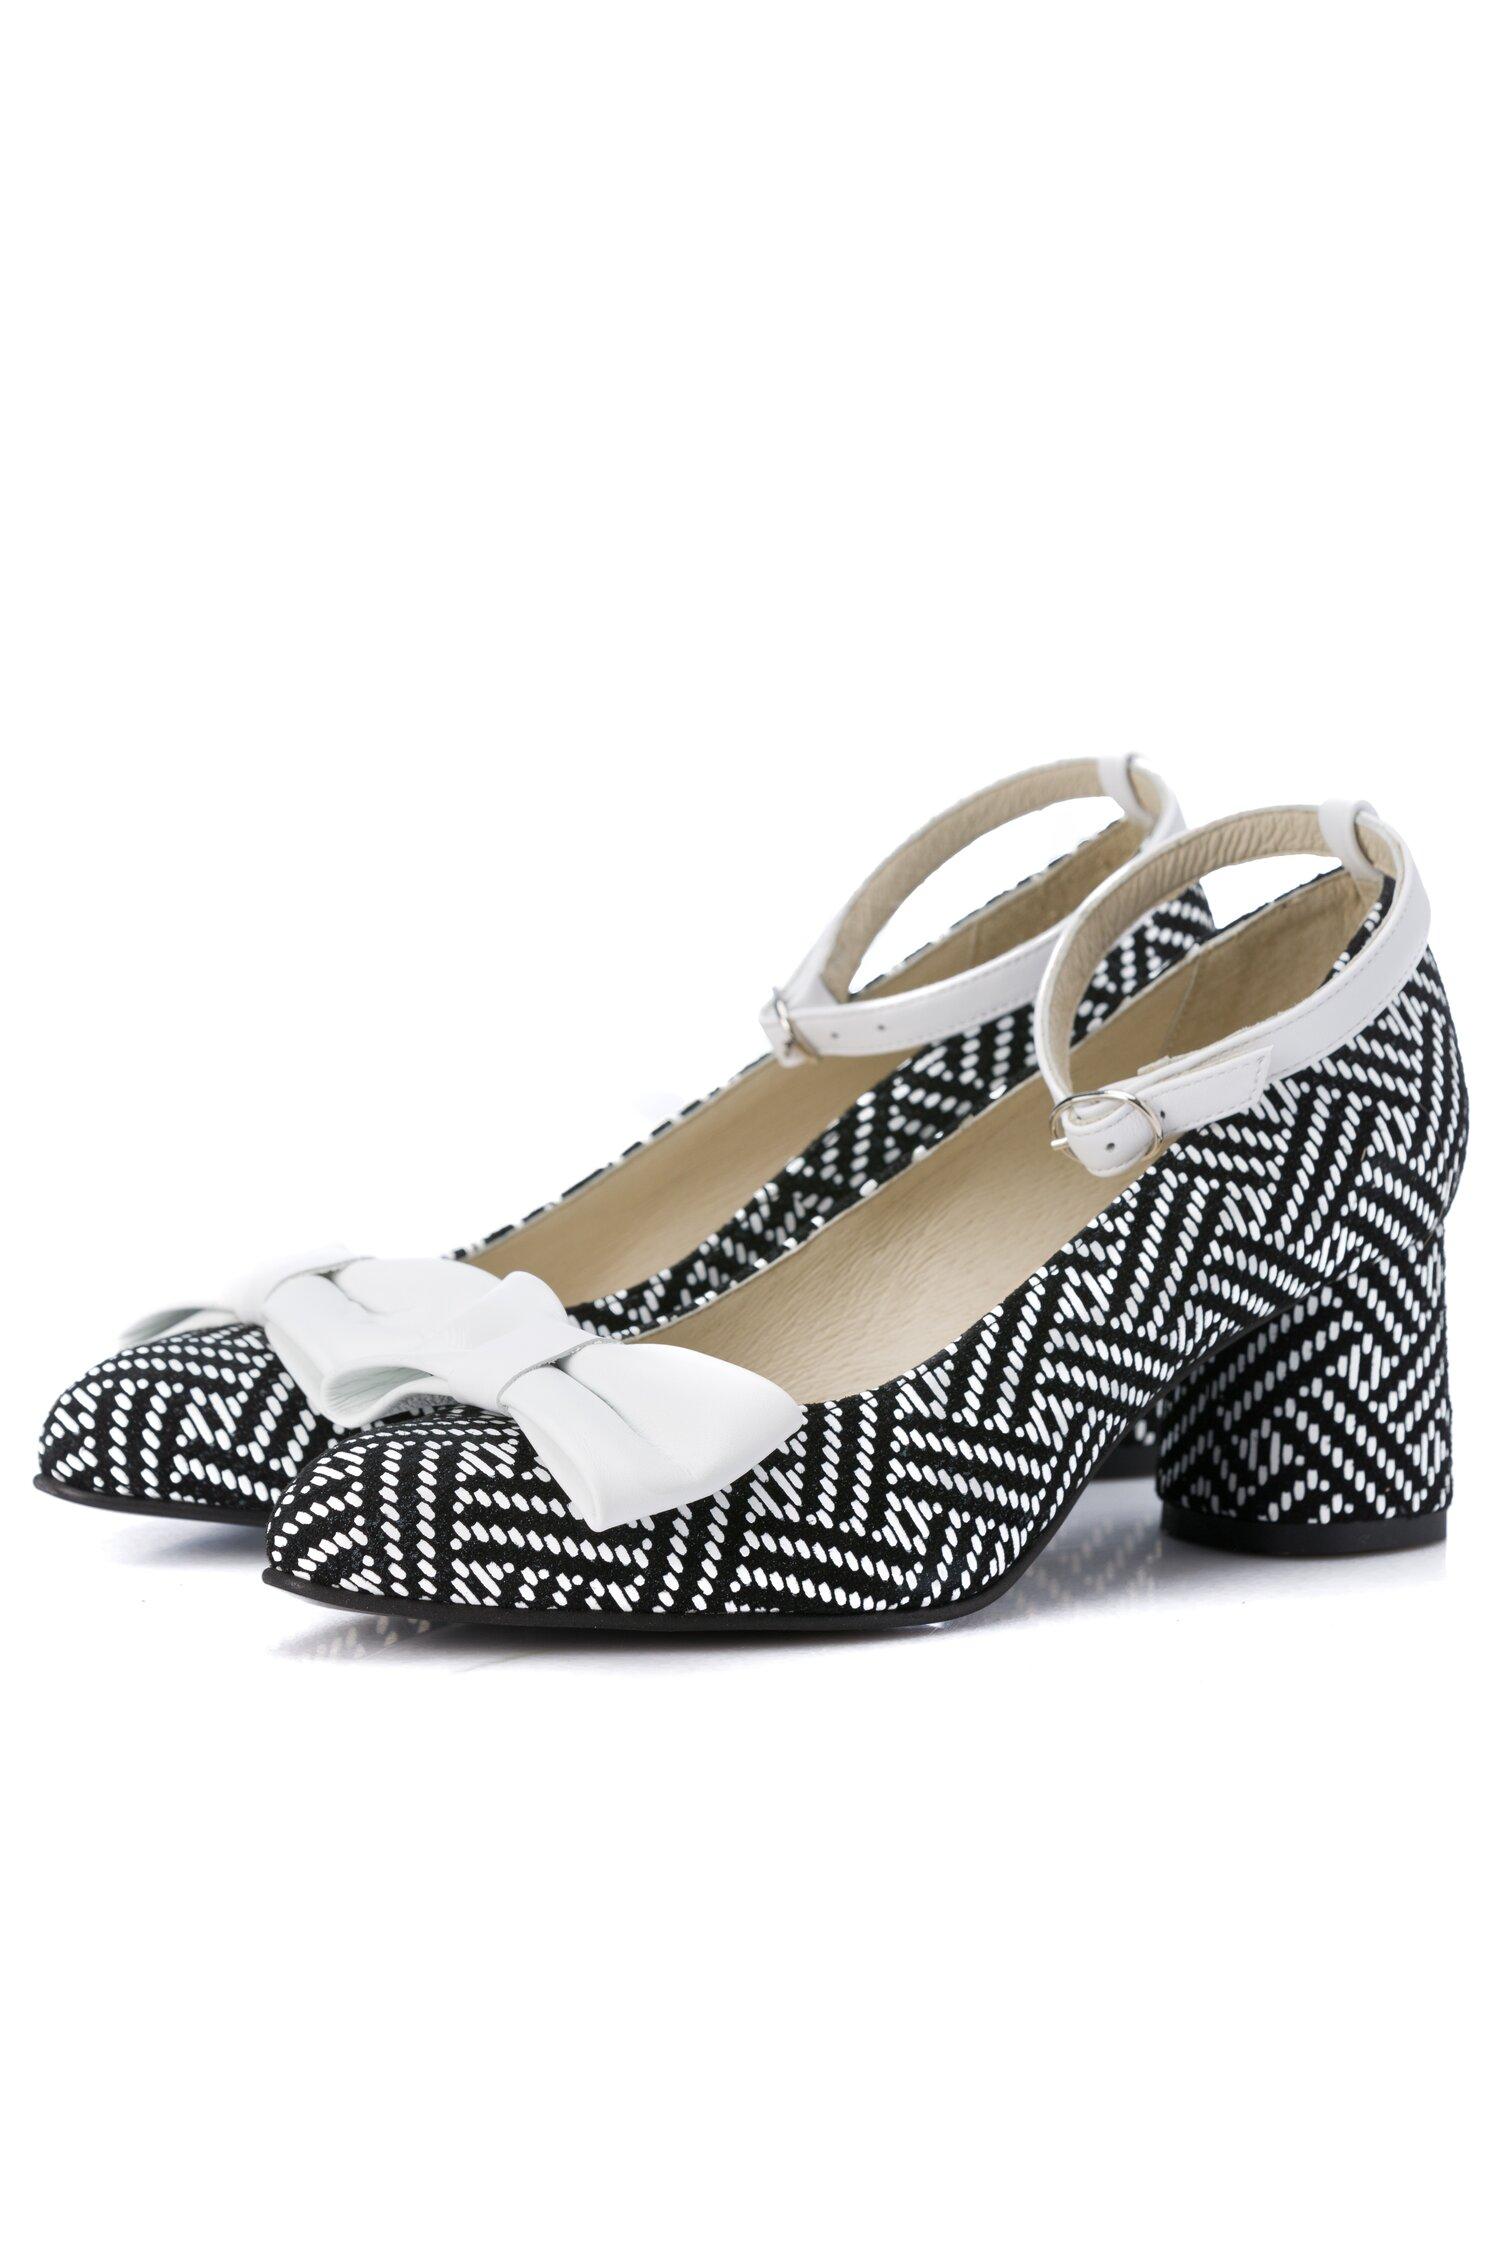 Pantofi negri cu imprimeuri albe cu bareta si fundita imagine